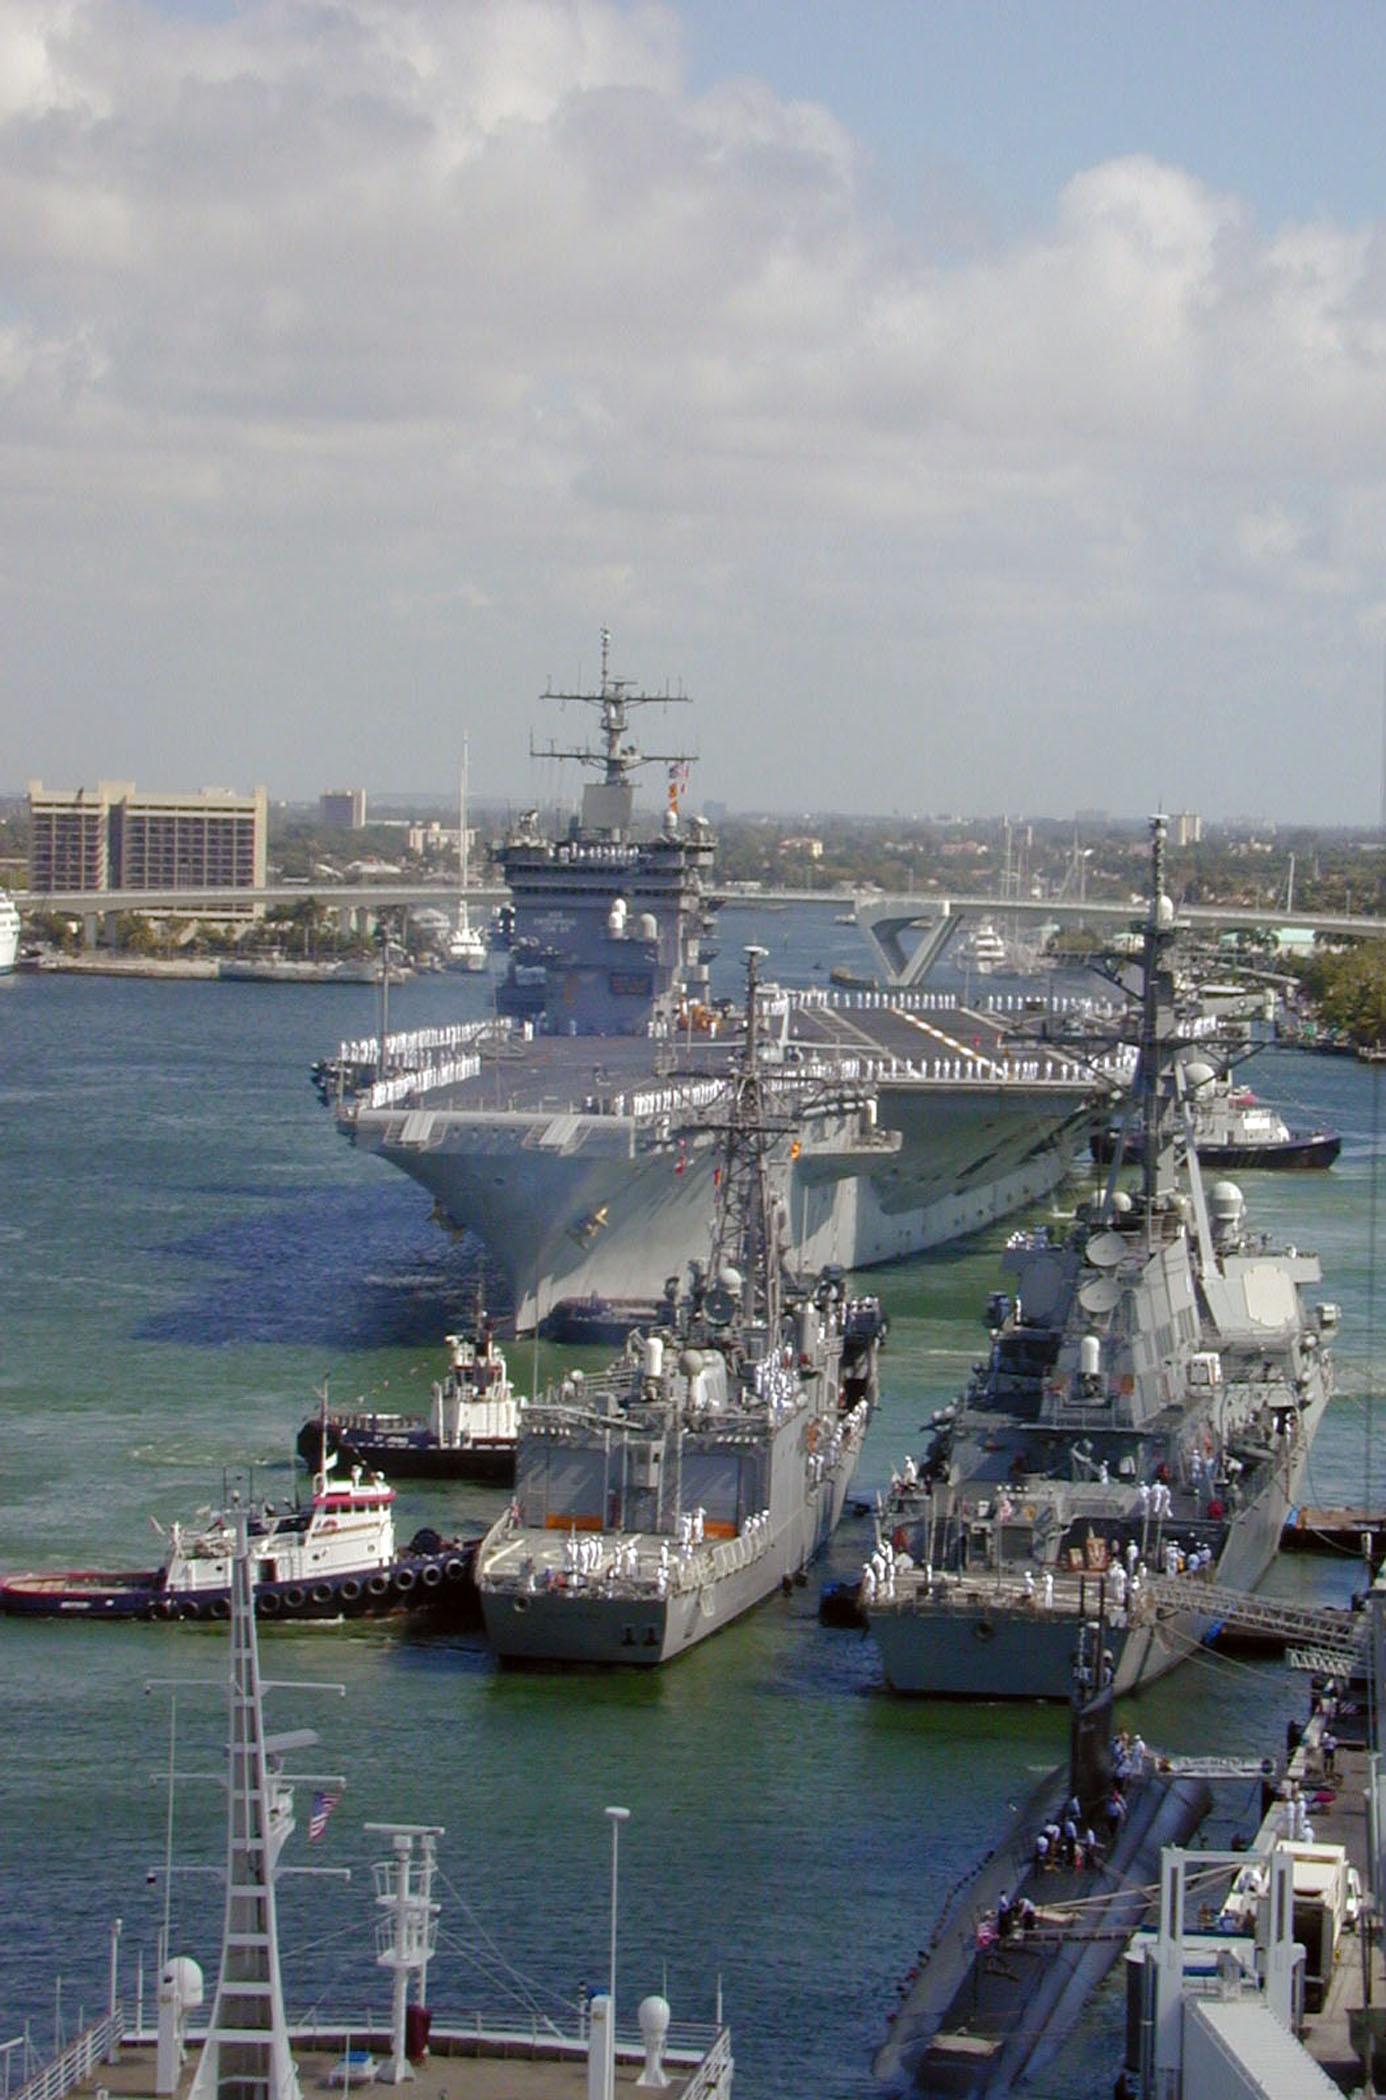 Port Everglades, Fort Lauderdale, FL